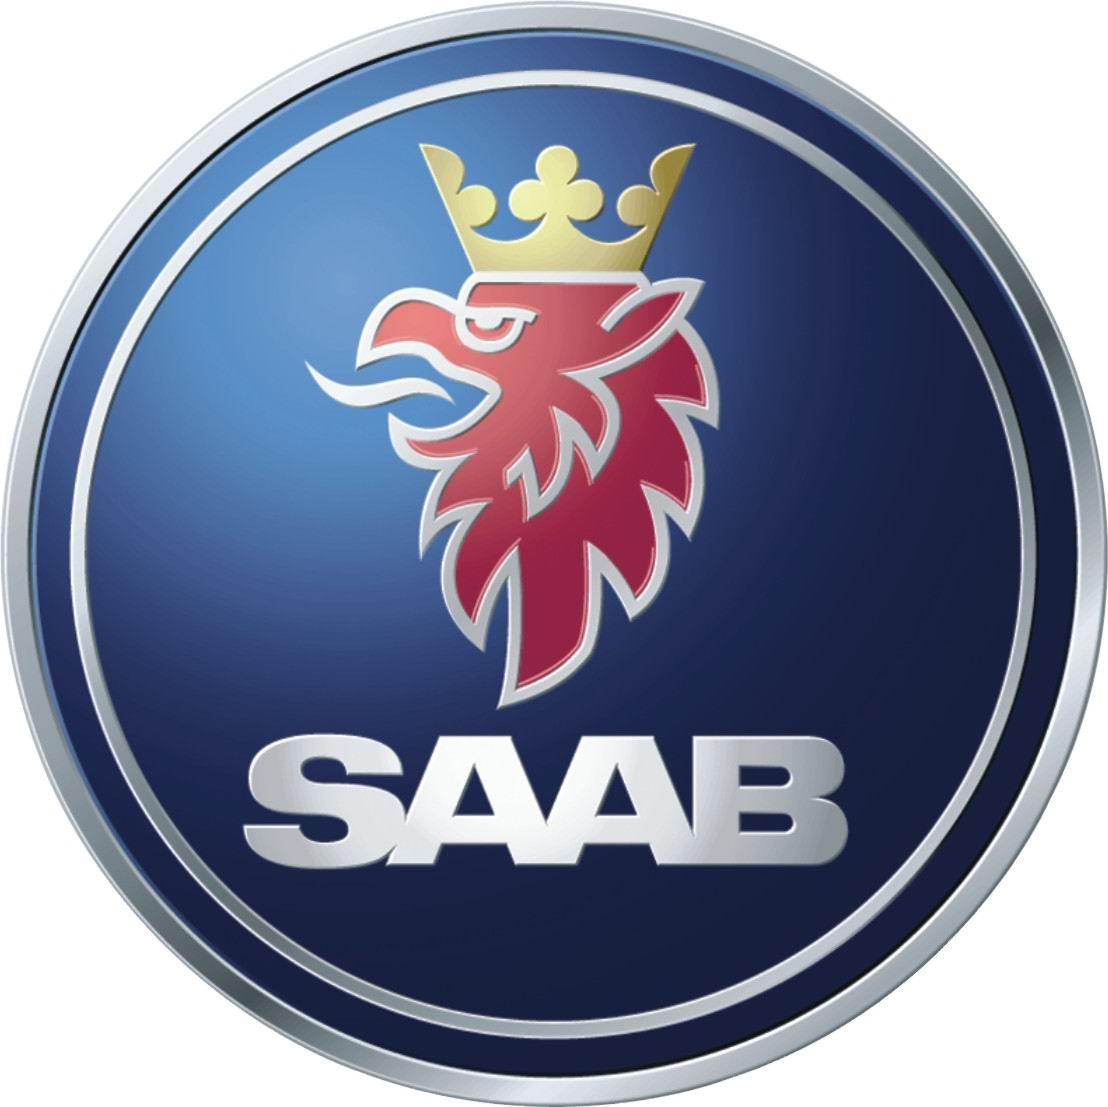 Best Car Logos: car company logos